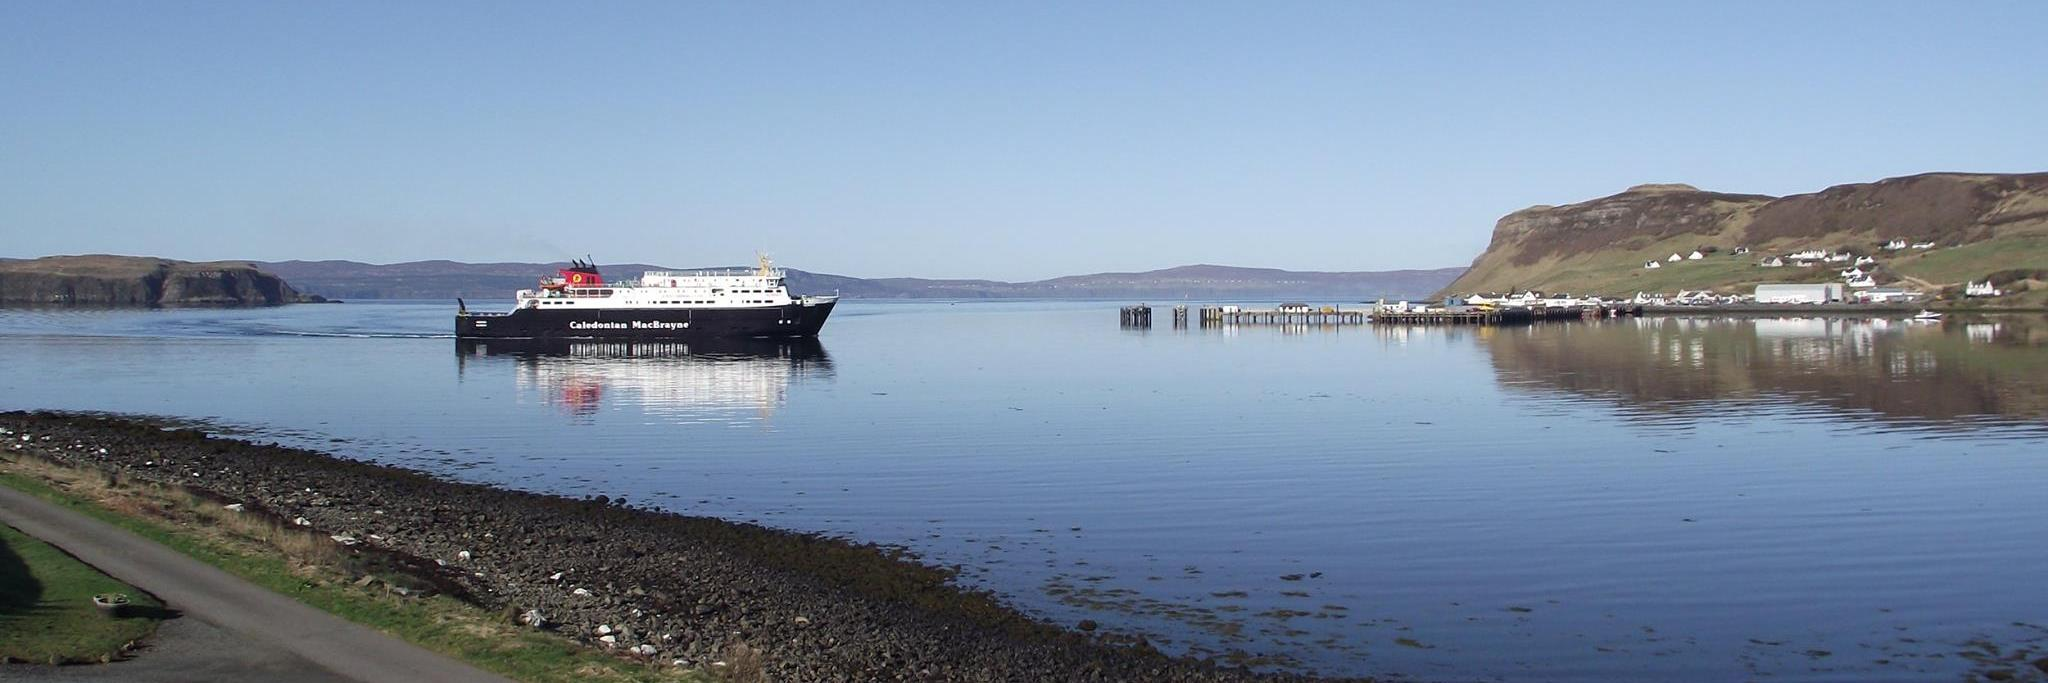 Explore Scotland by Ferry